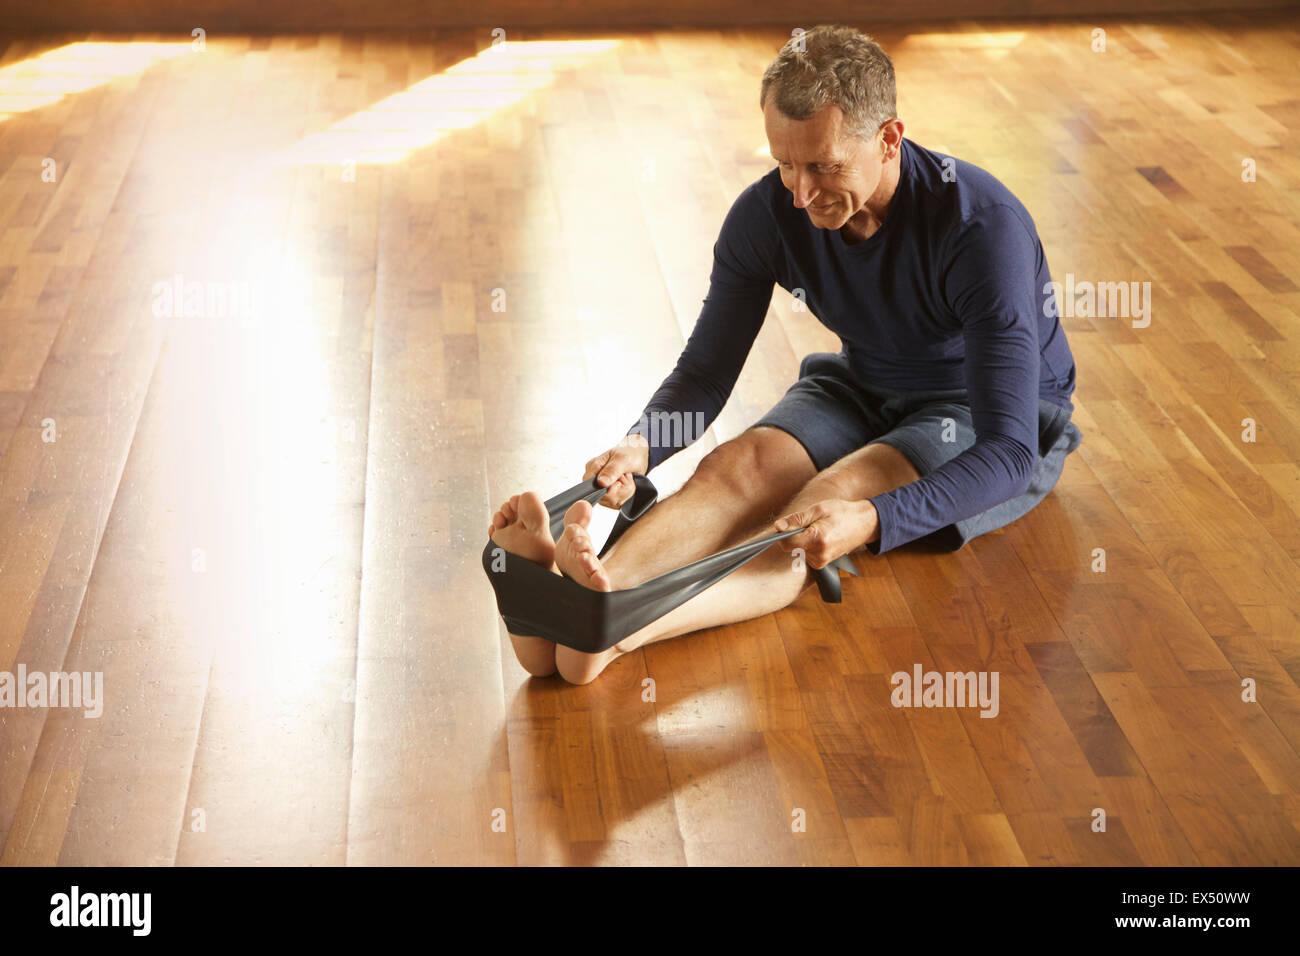 Reifer Mann Training mit Widerstand band Stockbild